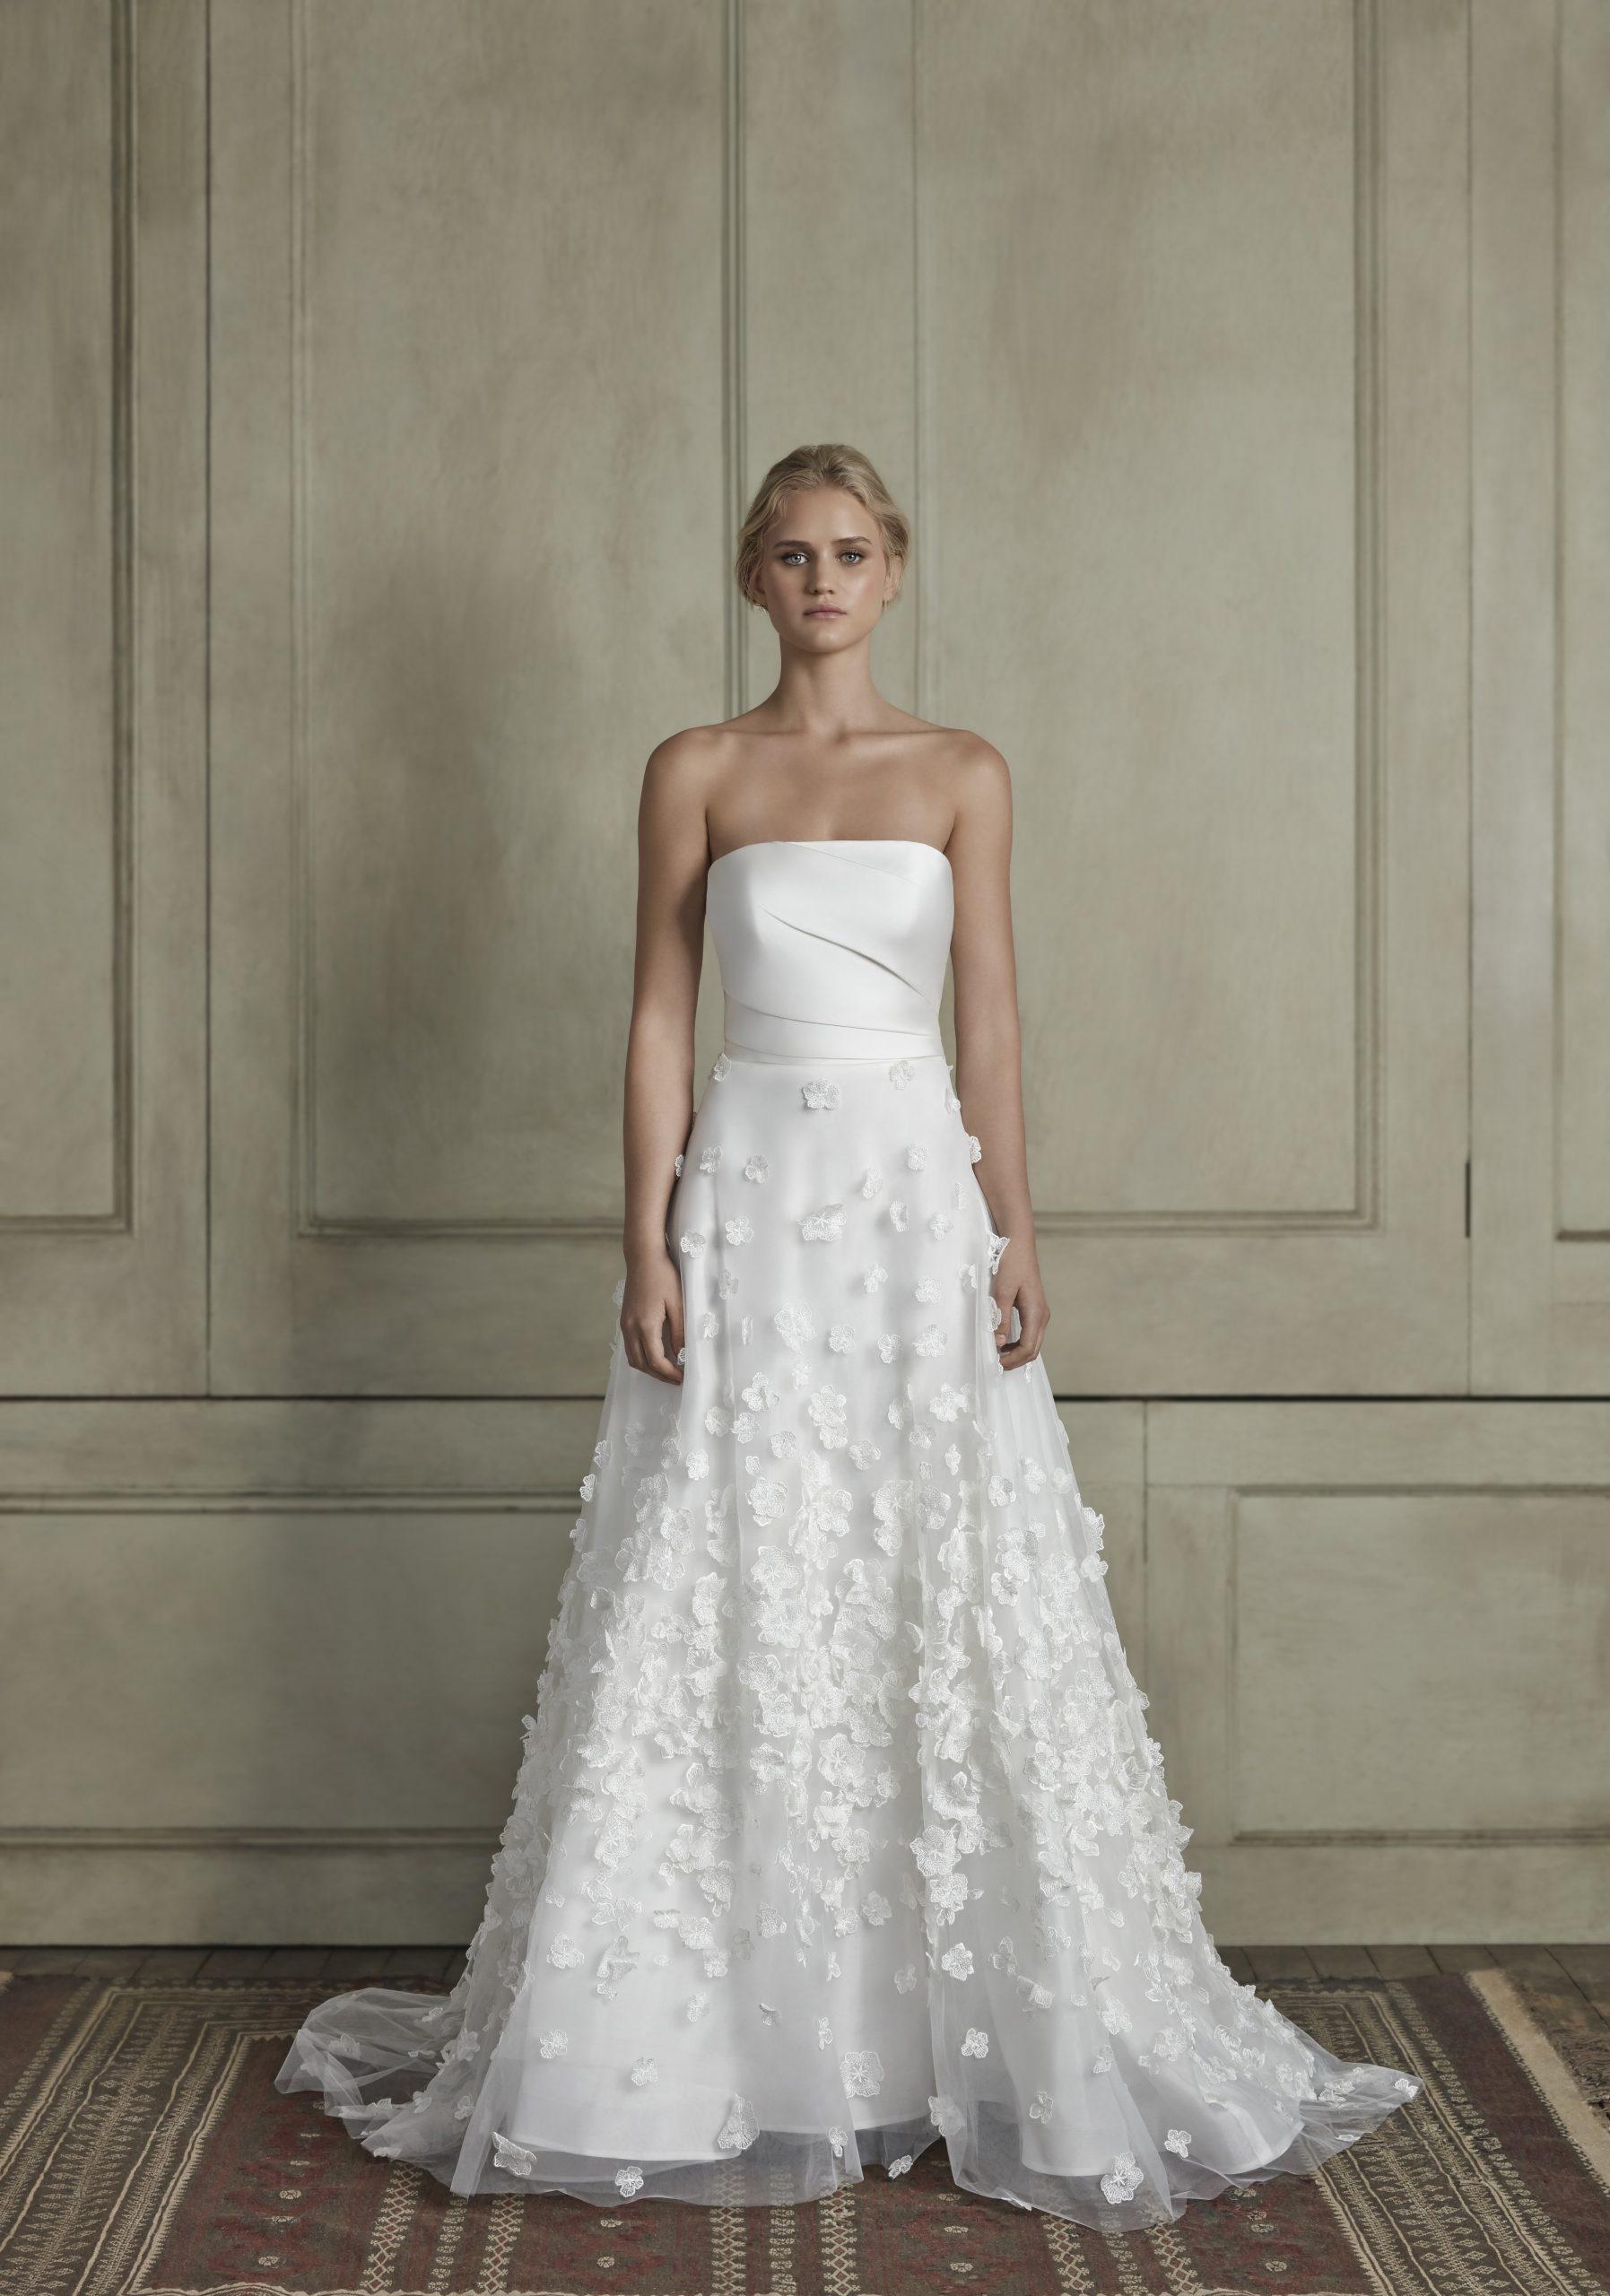 Strapless Straight Neckline Sheath Wedding Dress With Floral Applique Tulle Skirt Kleinfeld Bridal